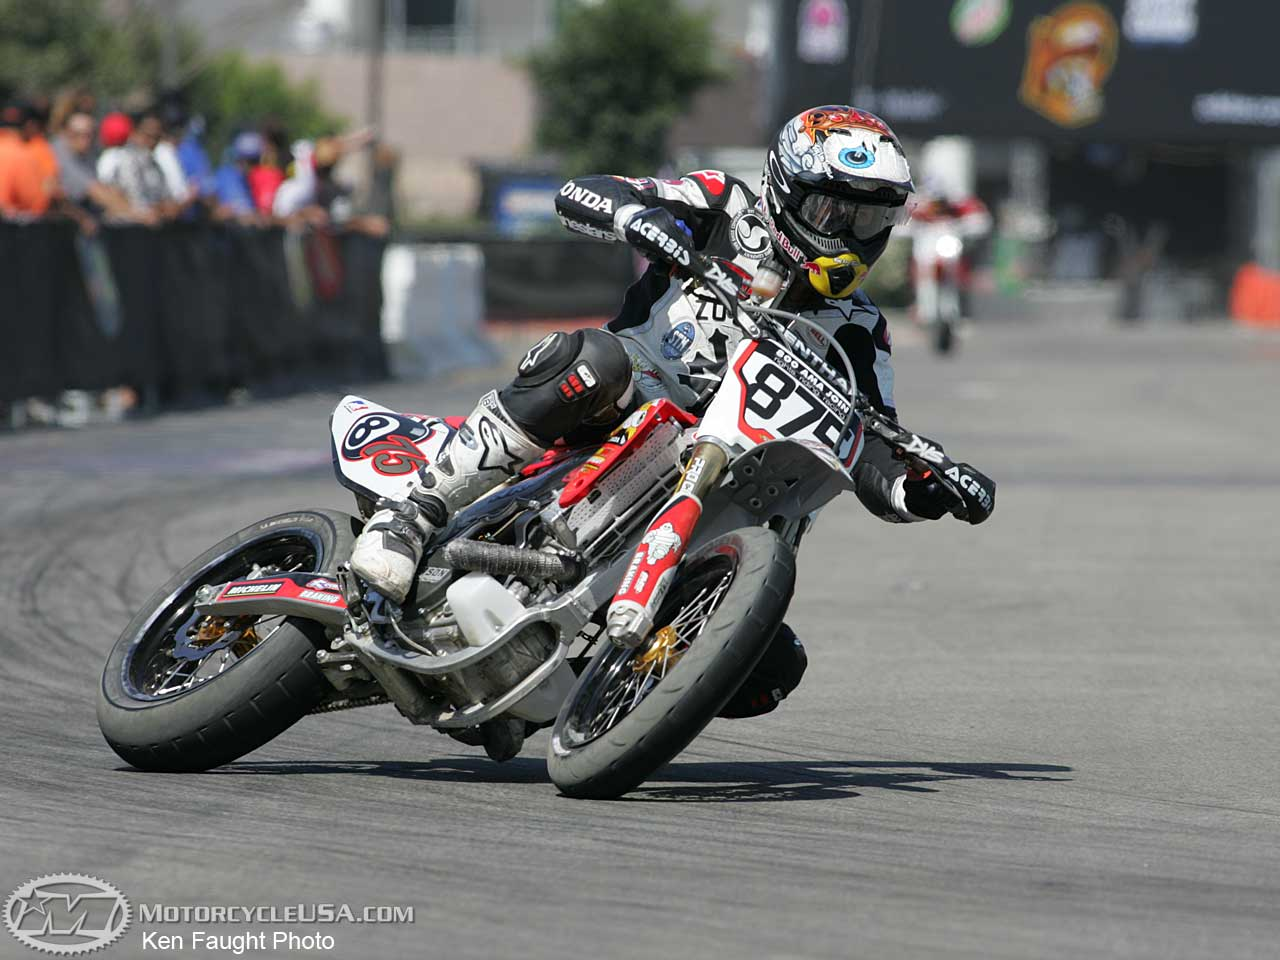 Ketika Honda CB150R Dan Yamaha Vixion Dimodifikasi Ala Supermoto